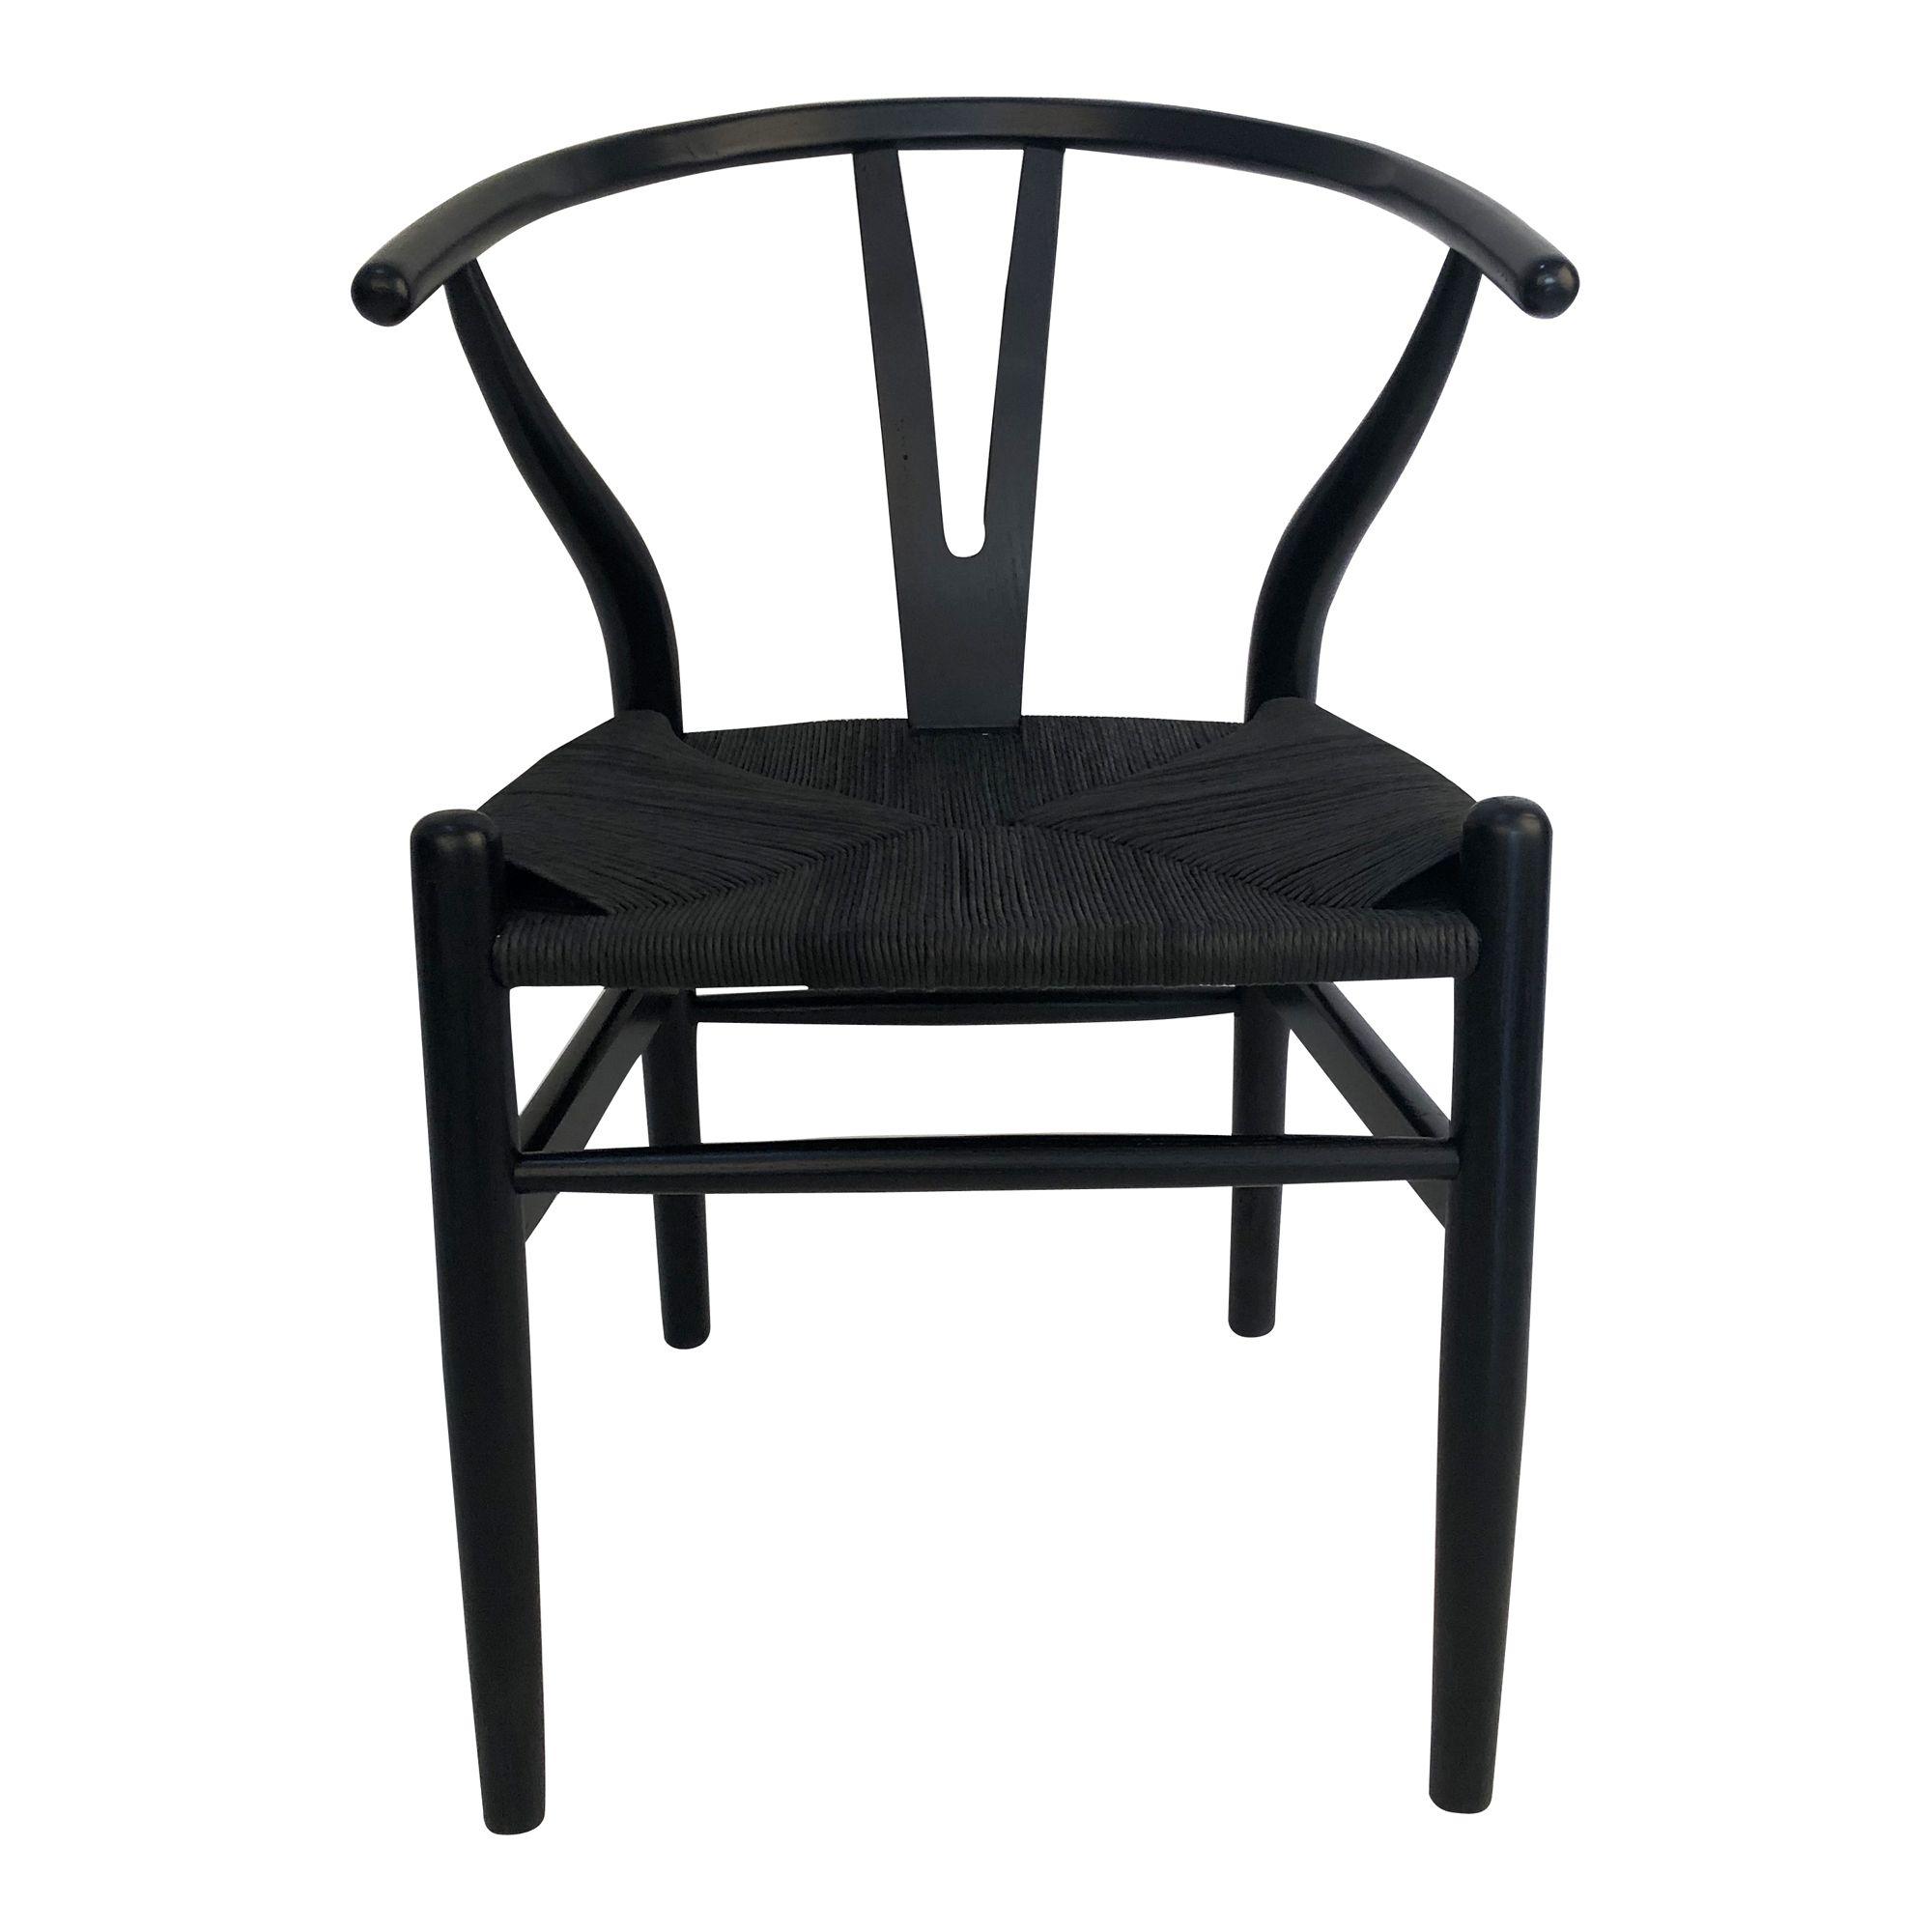 Ventana Dining Chair Black M2 Moe S Wholesale In 2020 Dining Chairs Dining Chair Set Moe S Home Collection